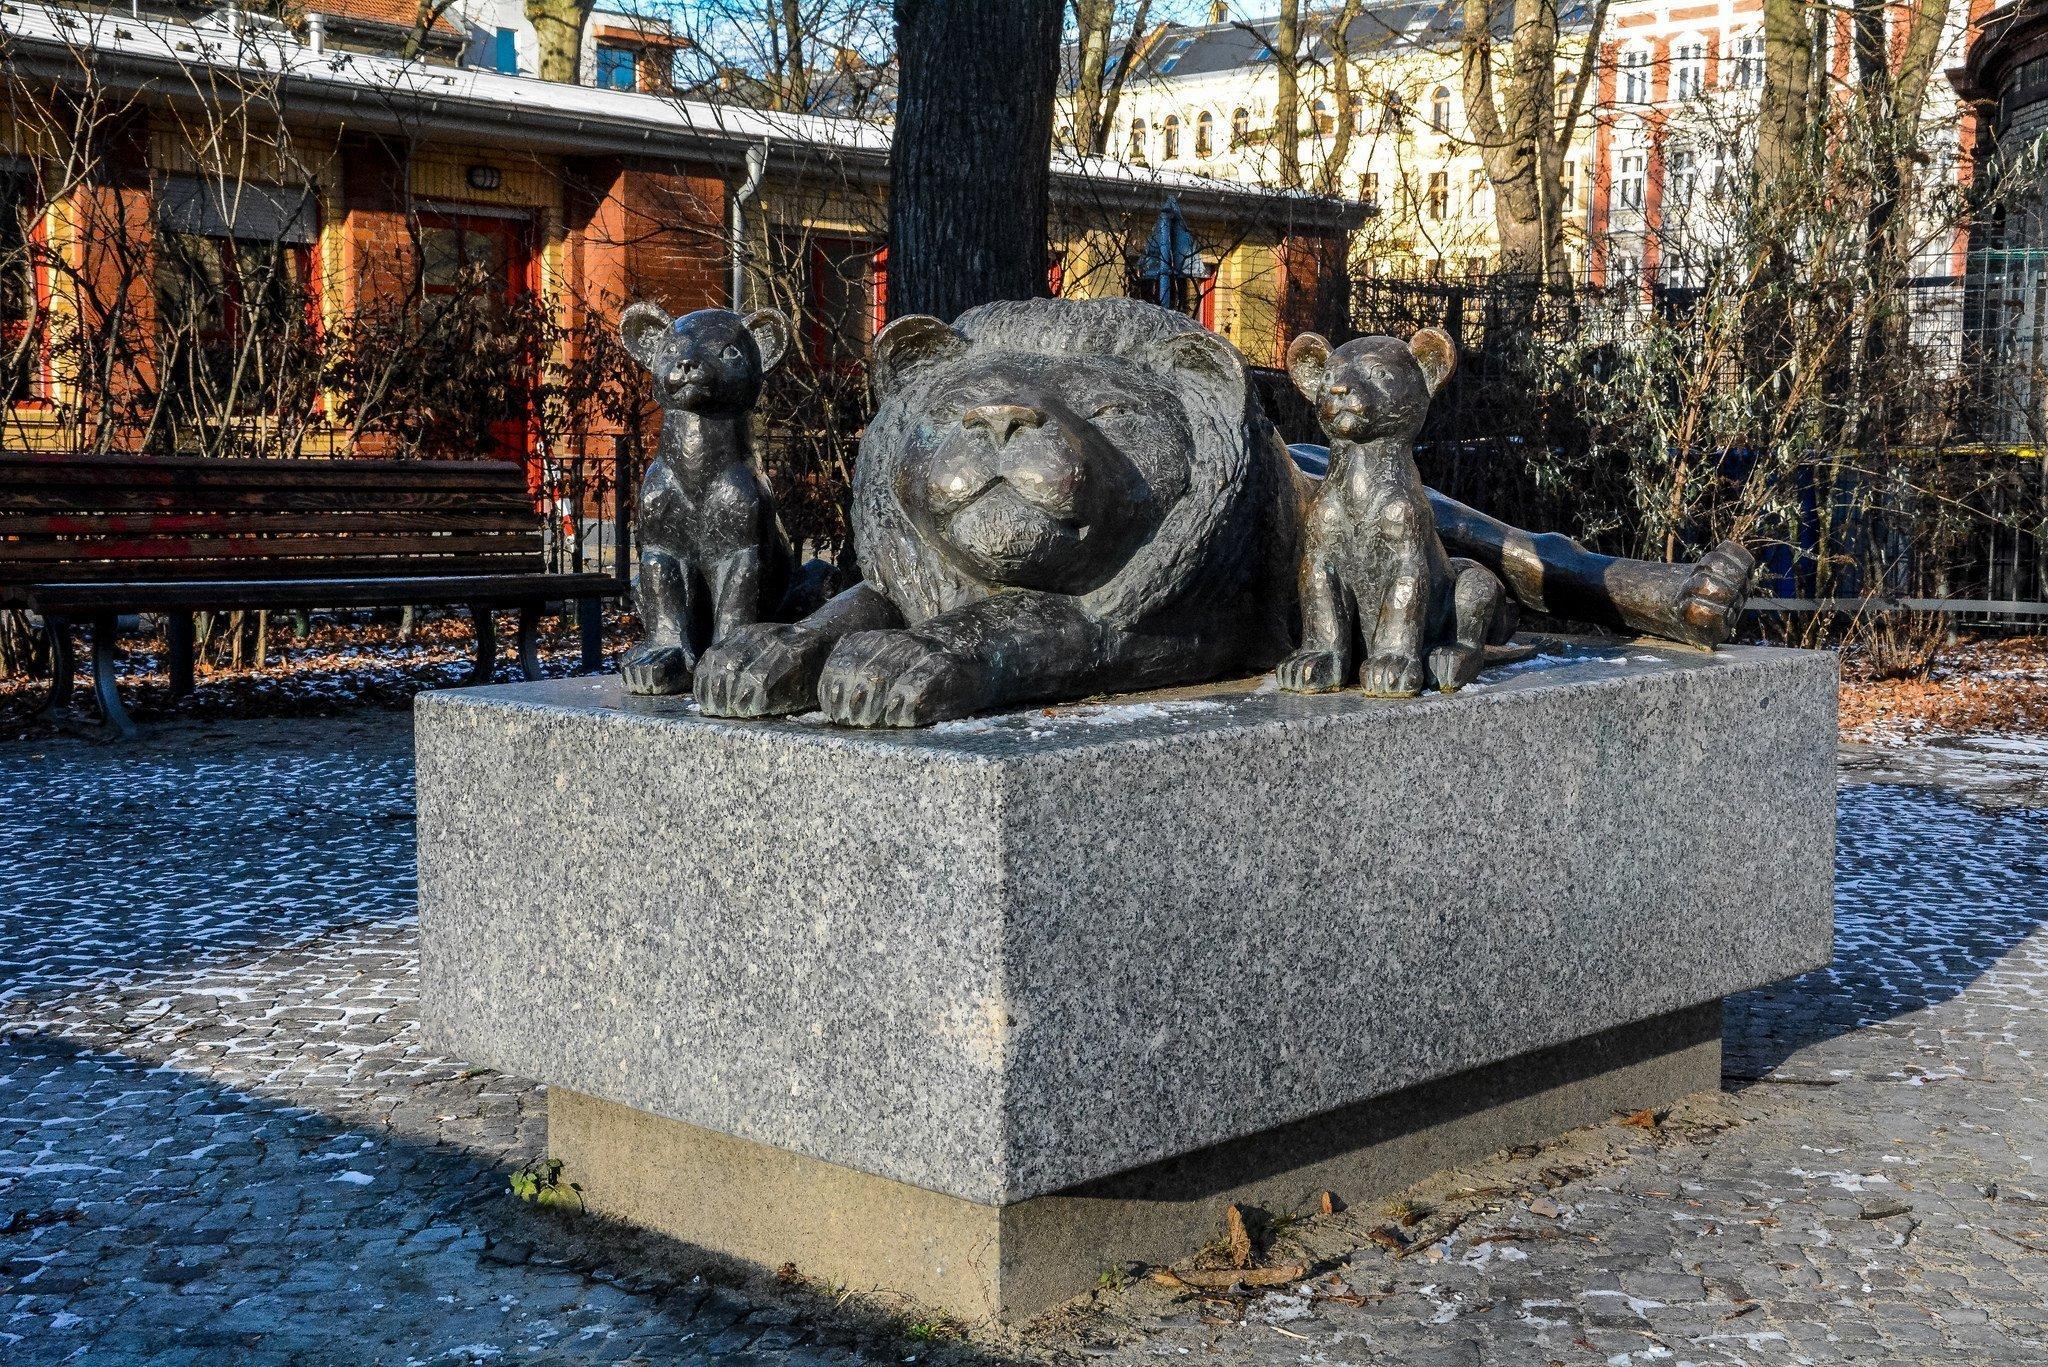 berlin prenzlauer berg wasserturm water tower loewen brunnen lion fountain